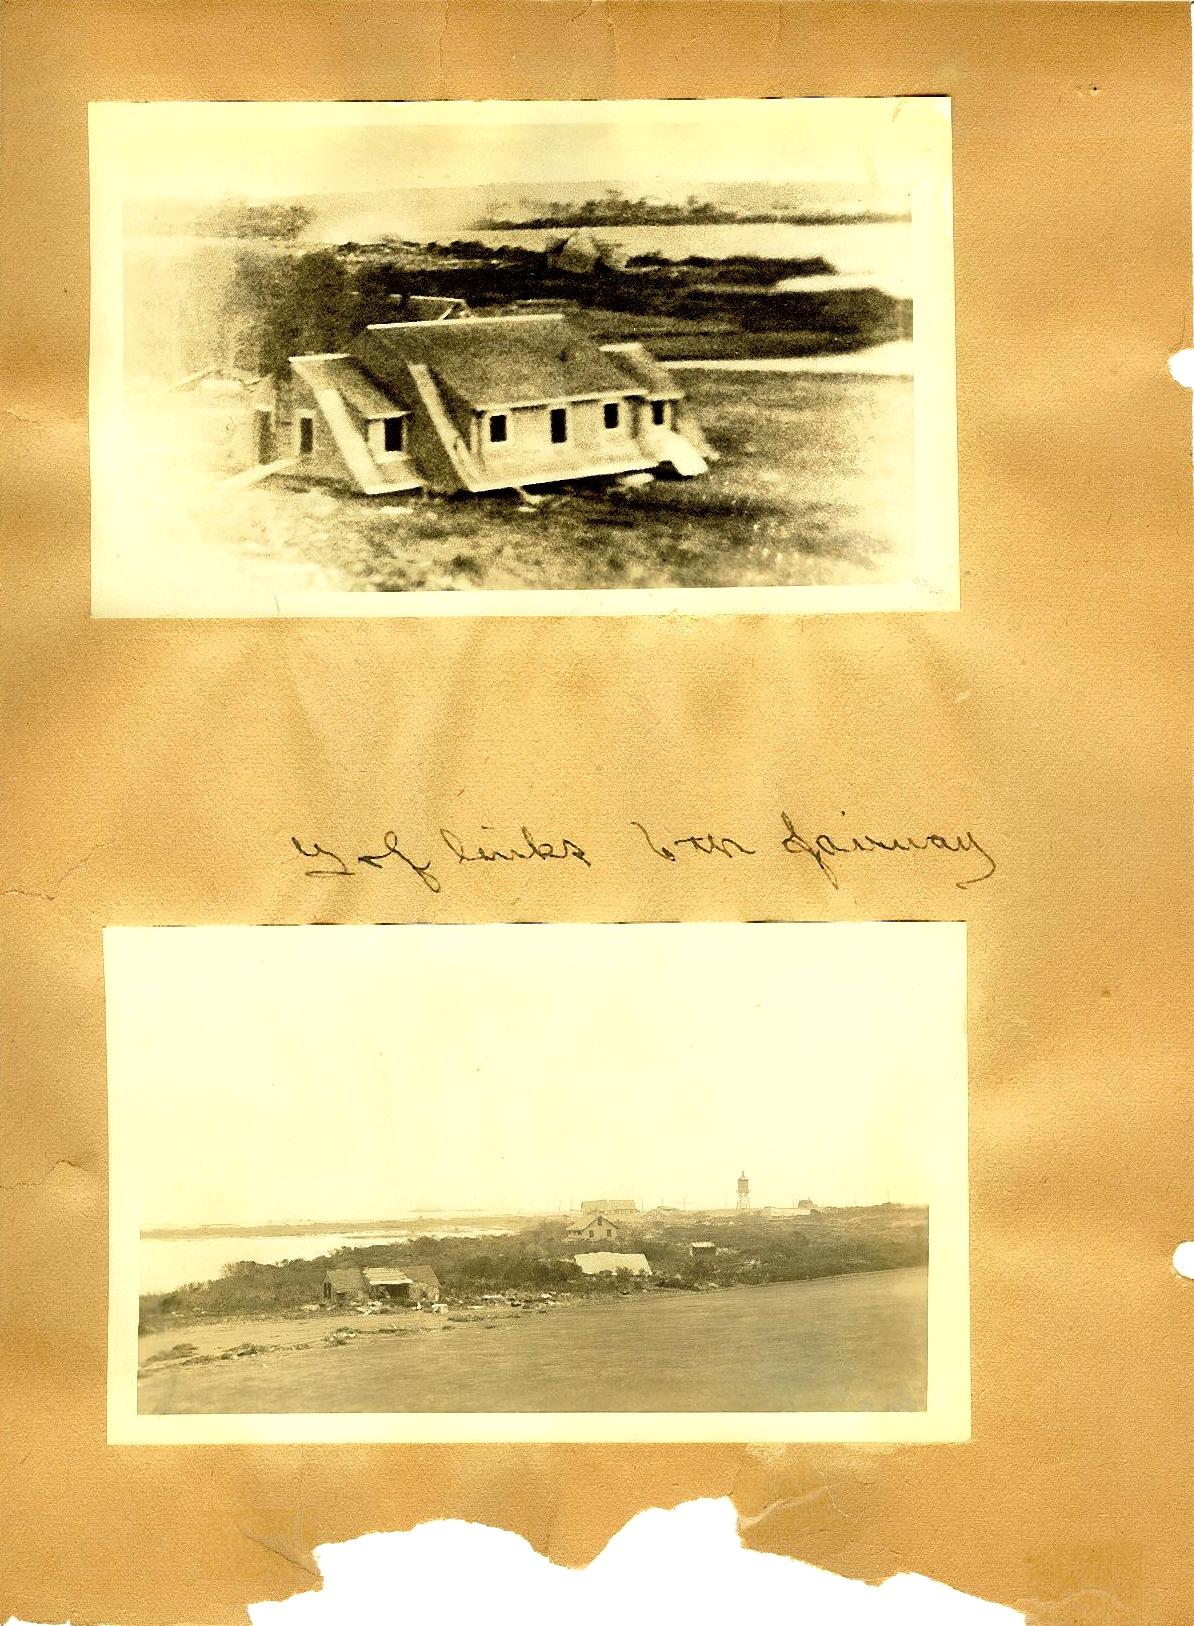 The 1938 Hurricane photos p18